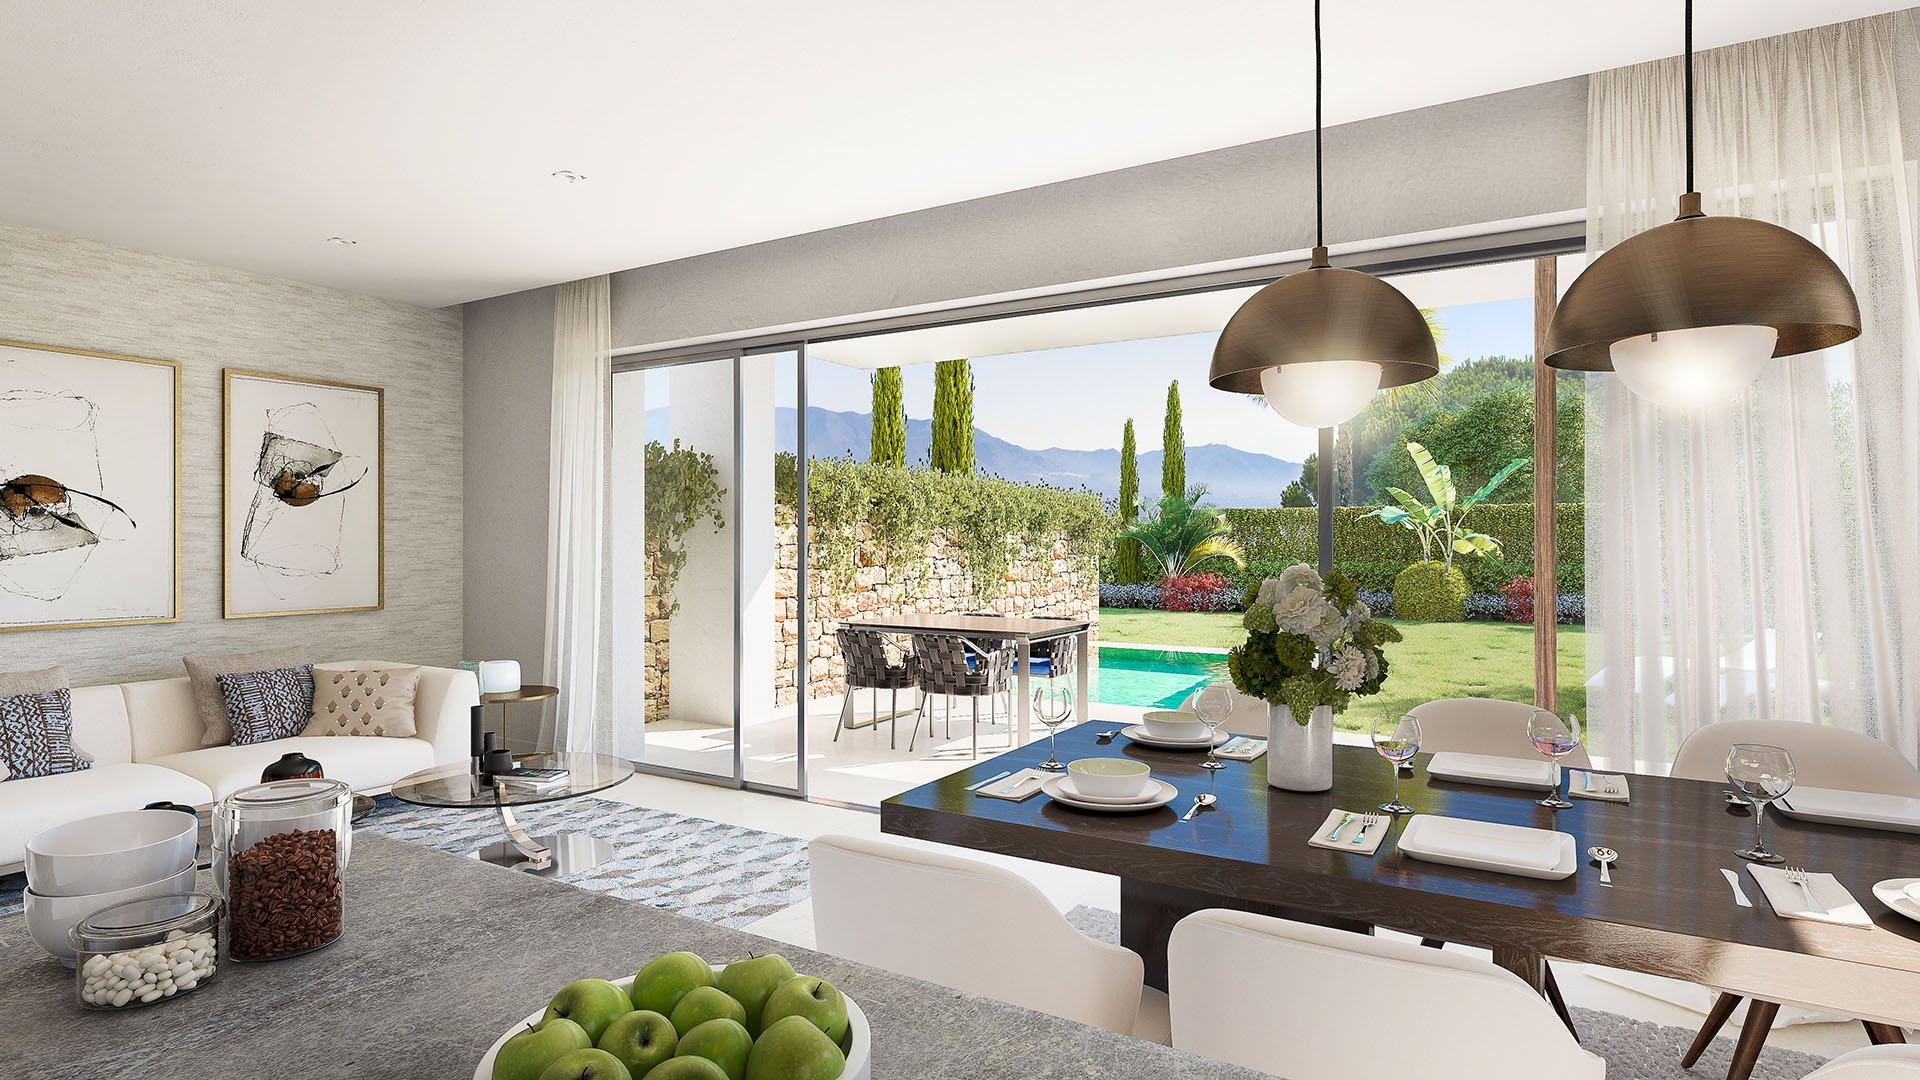 Elite: Luxury townhouses in an idyllic environment